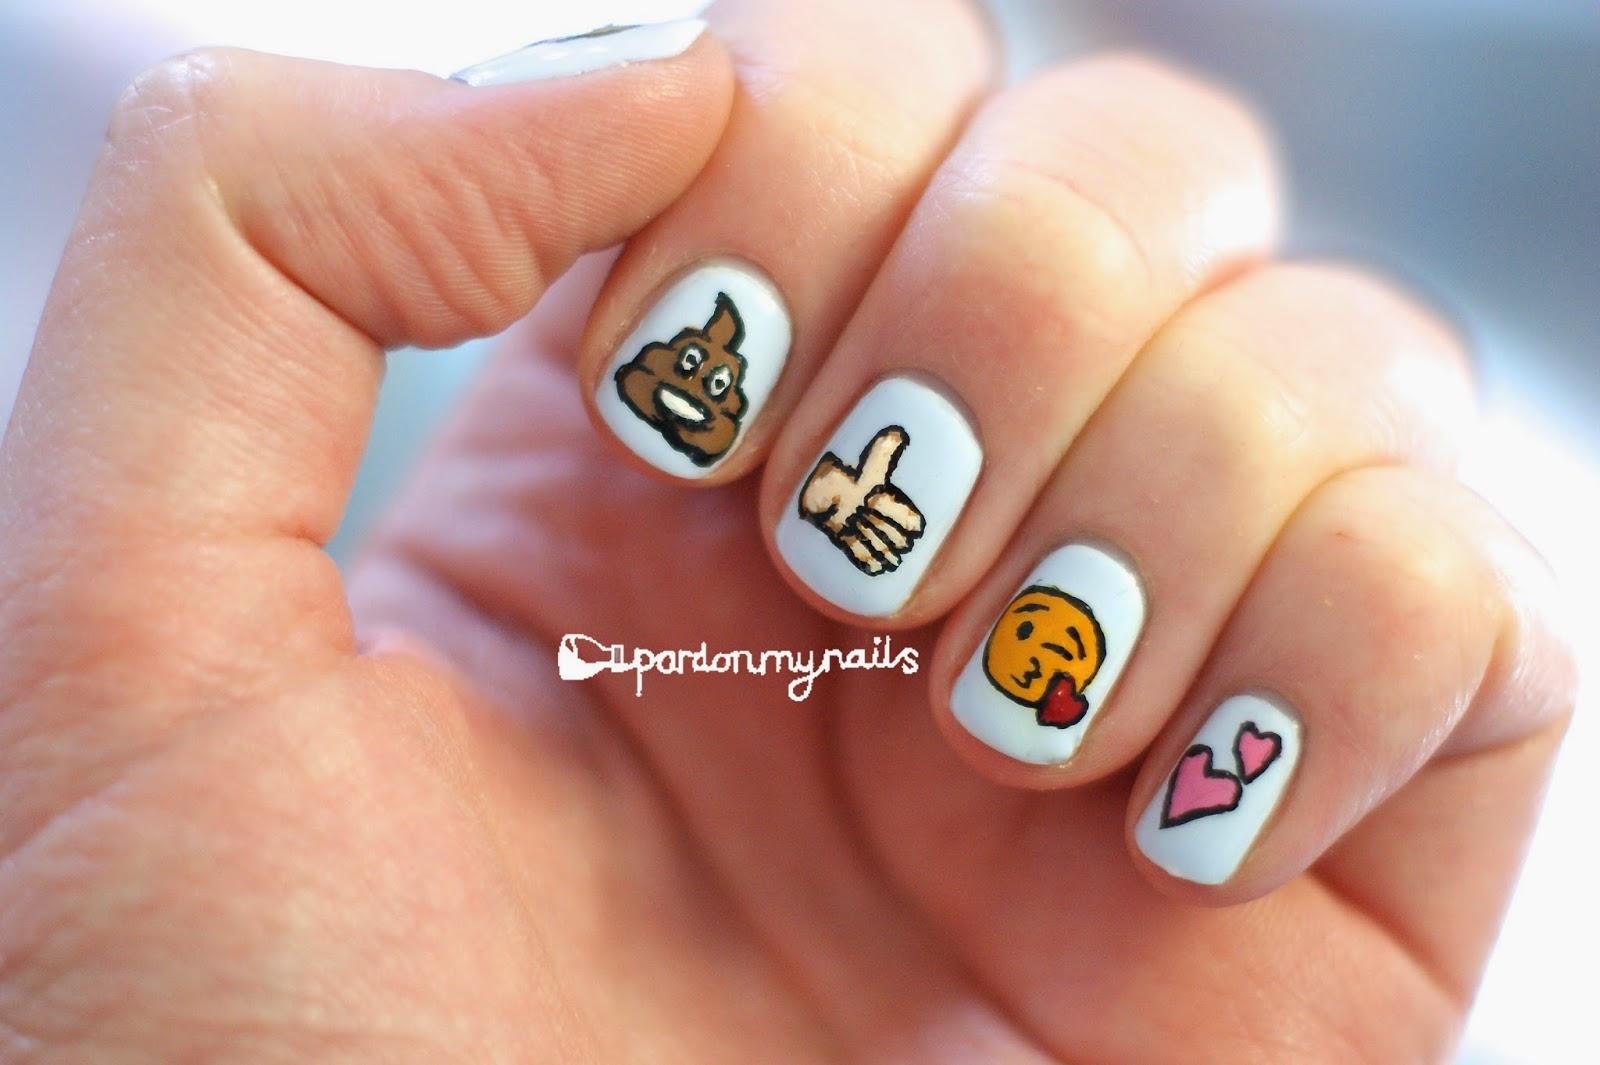 Emoji nail art designs : Pardon my nails uk nail art freehand emoji